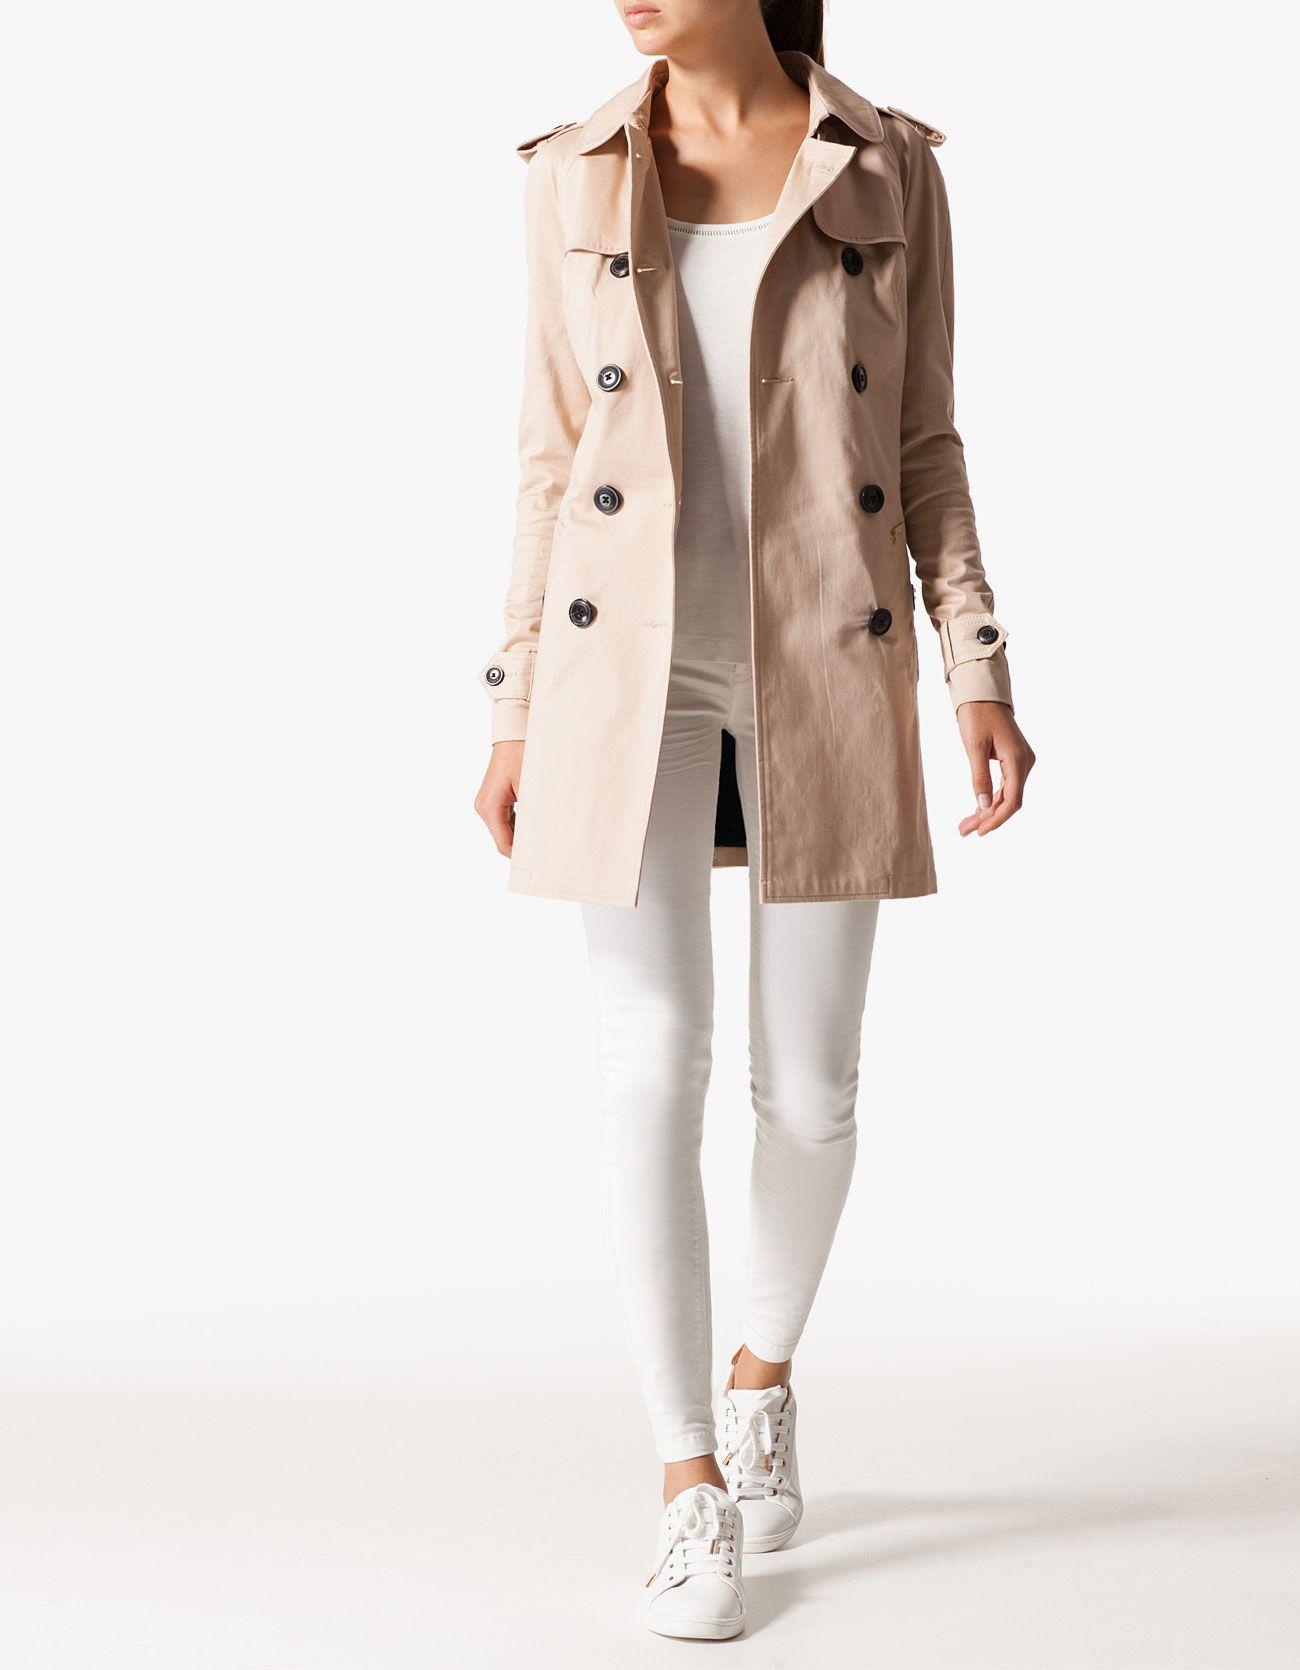 4acaa3fc69 Stradivarius Μακριά καμπαρντίνα | Just fashion......... | Zara ...